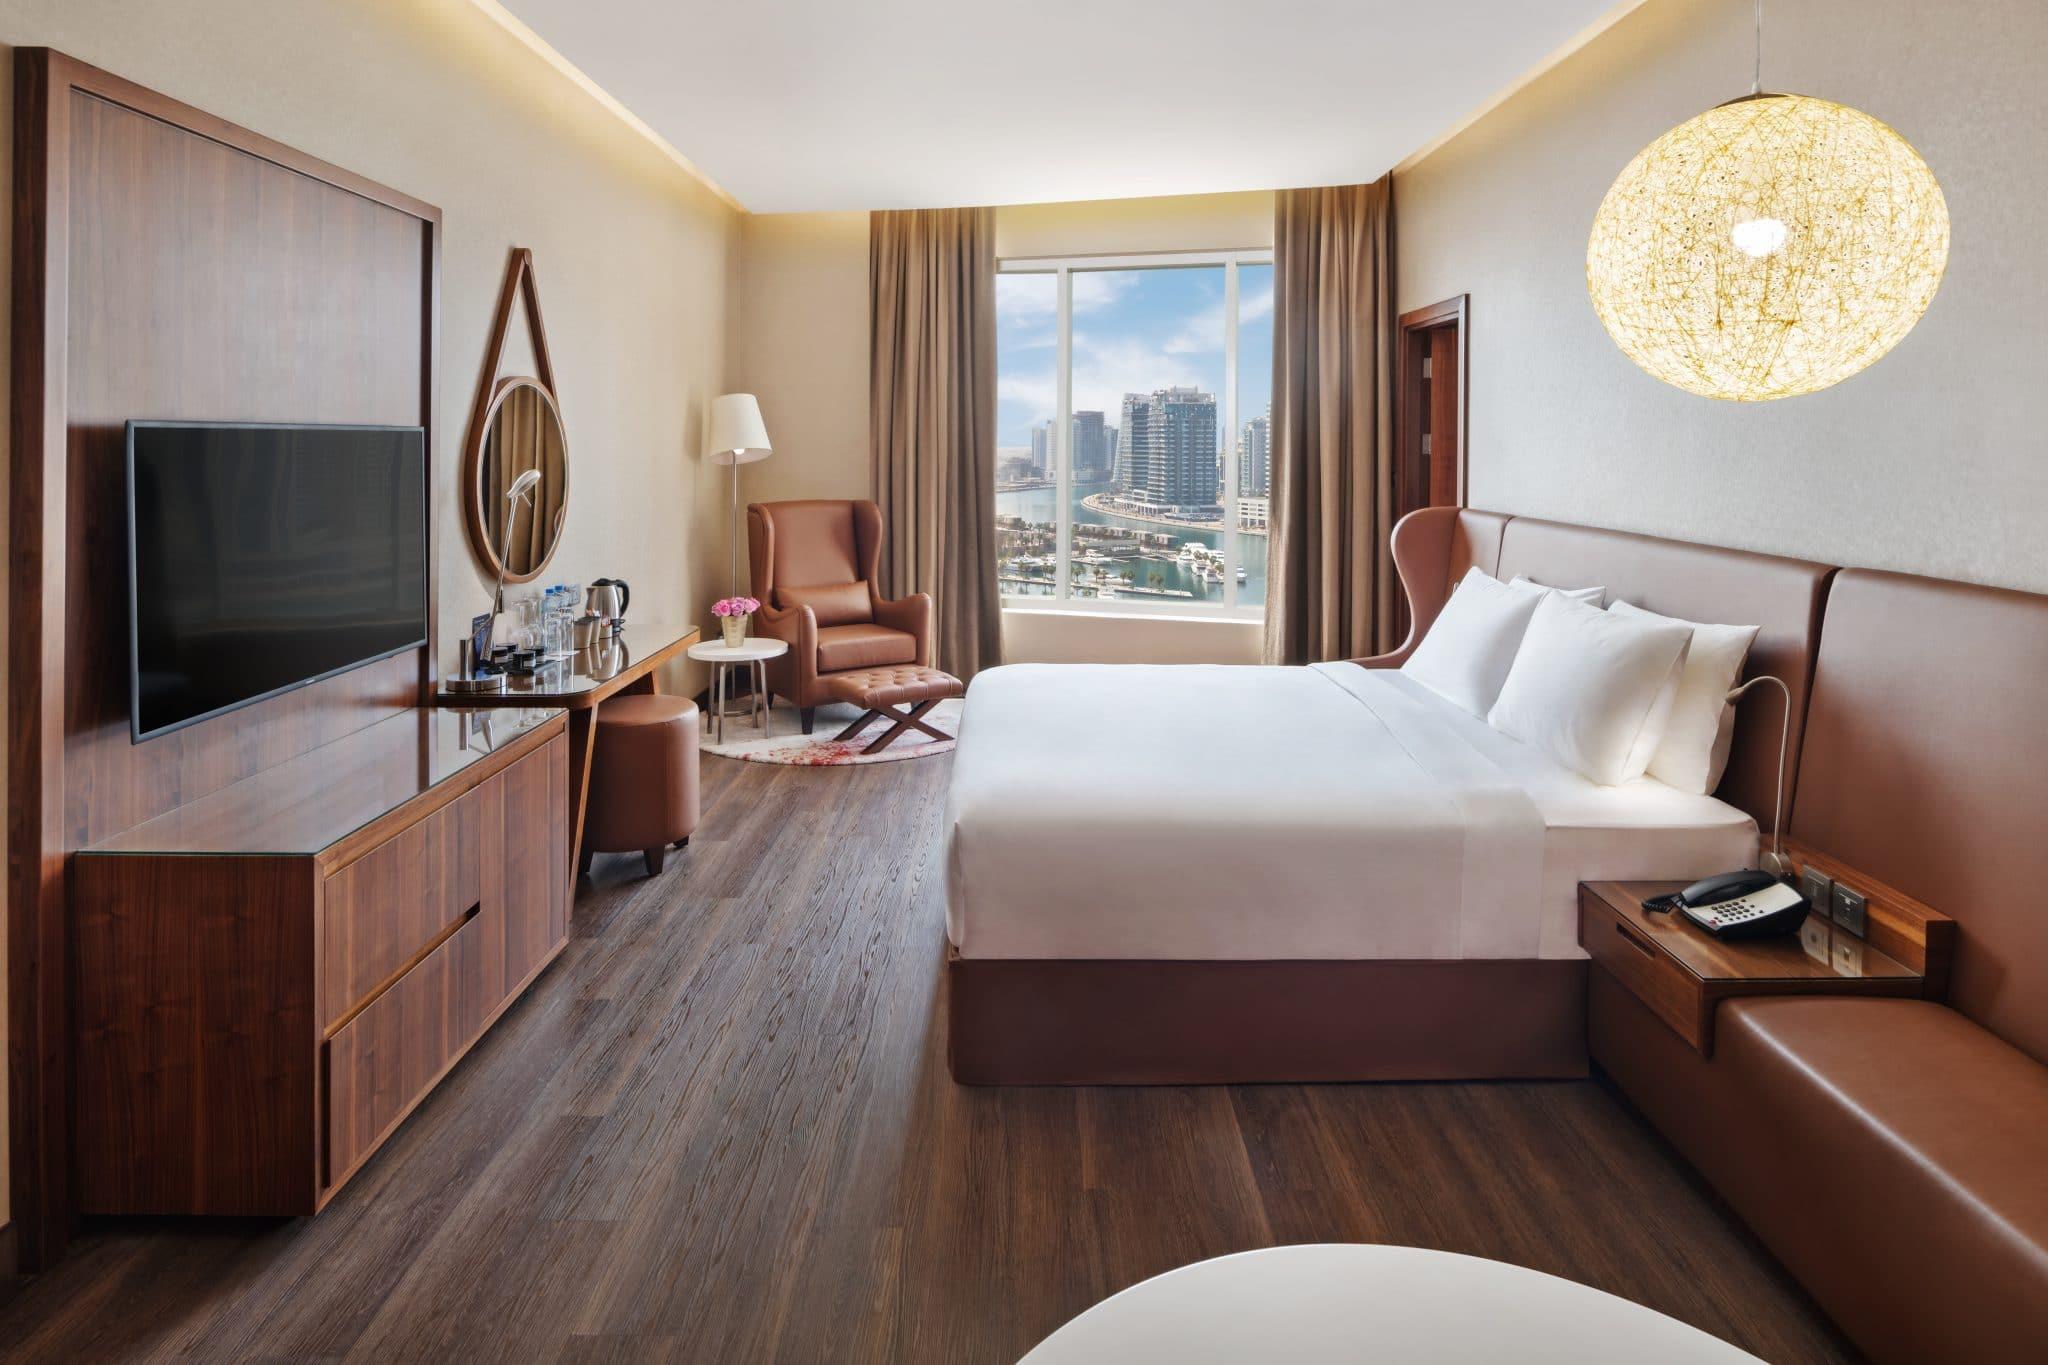 فندق راديسون بلو دبي كانال فيو